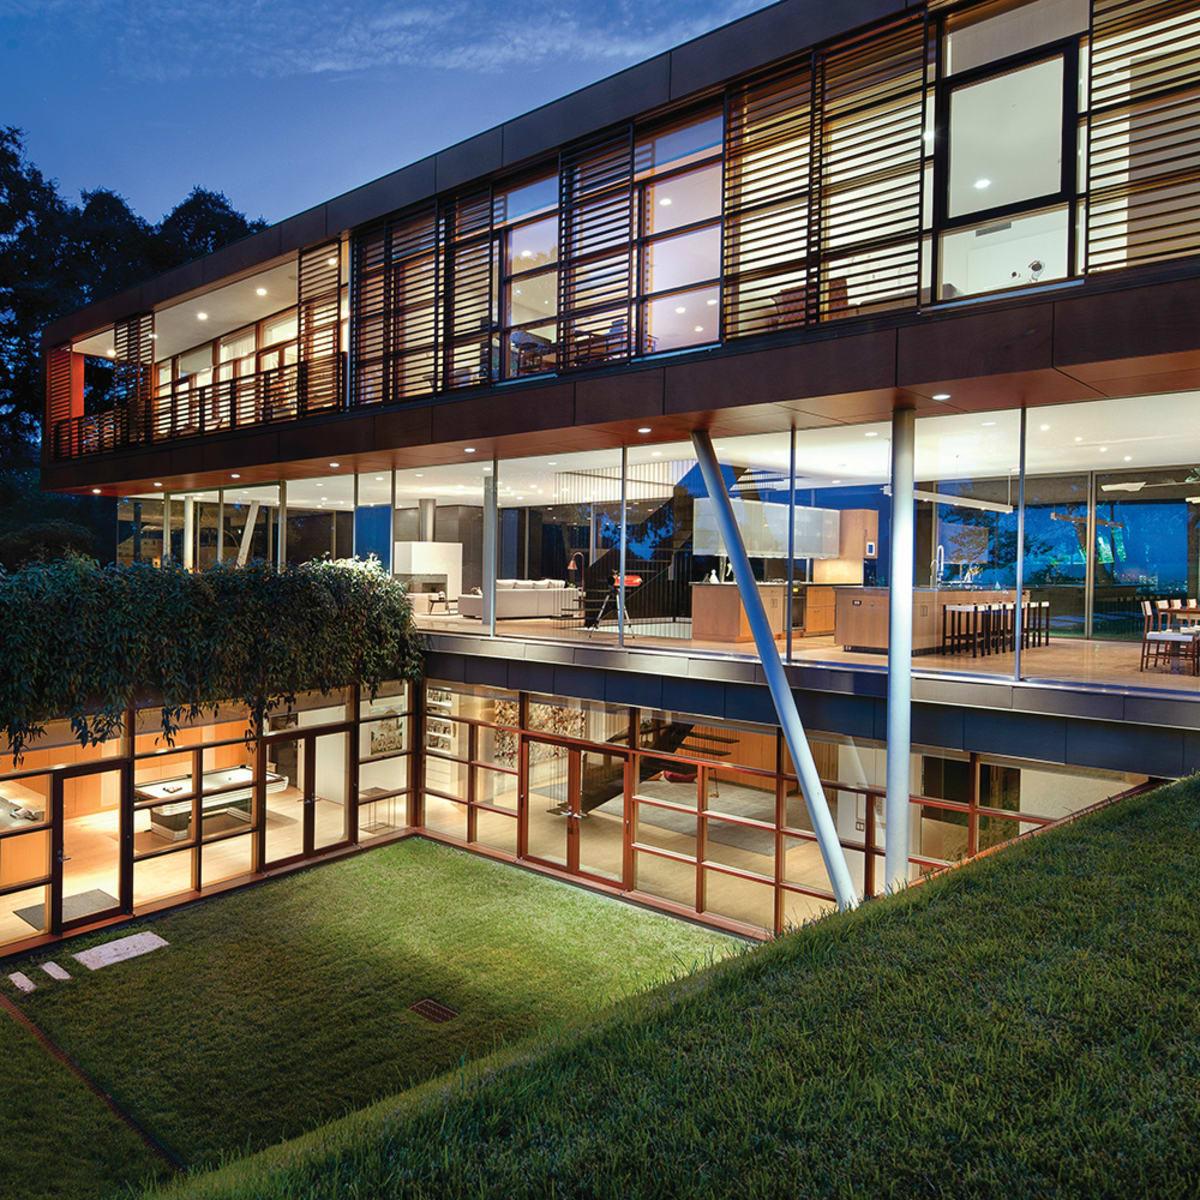 Austin home Floating Box House 900 Live Oak Circle West Lake Hills 78746 April 2016 exterior back side night